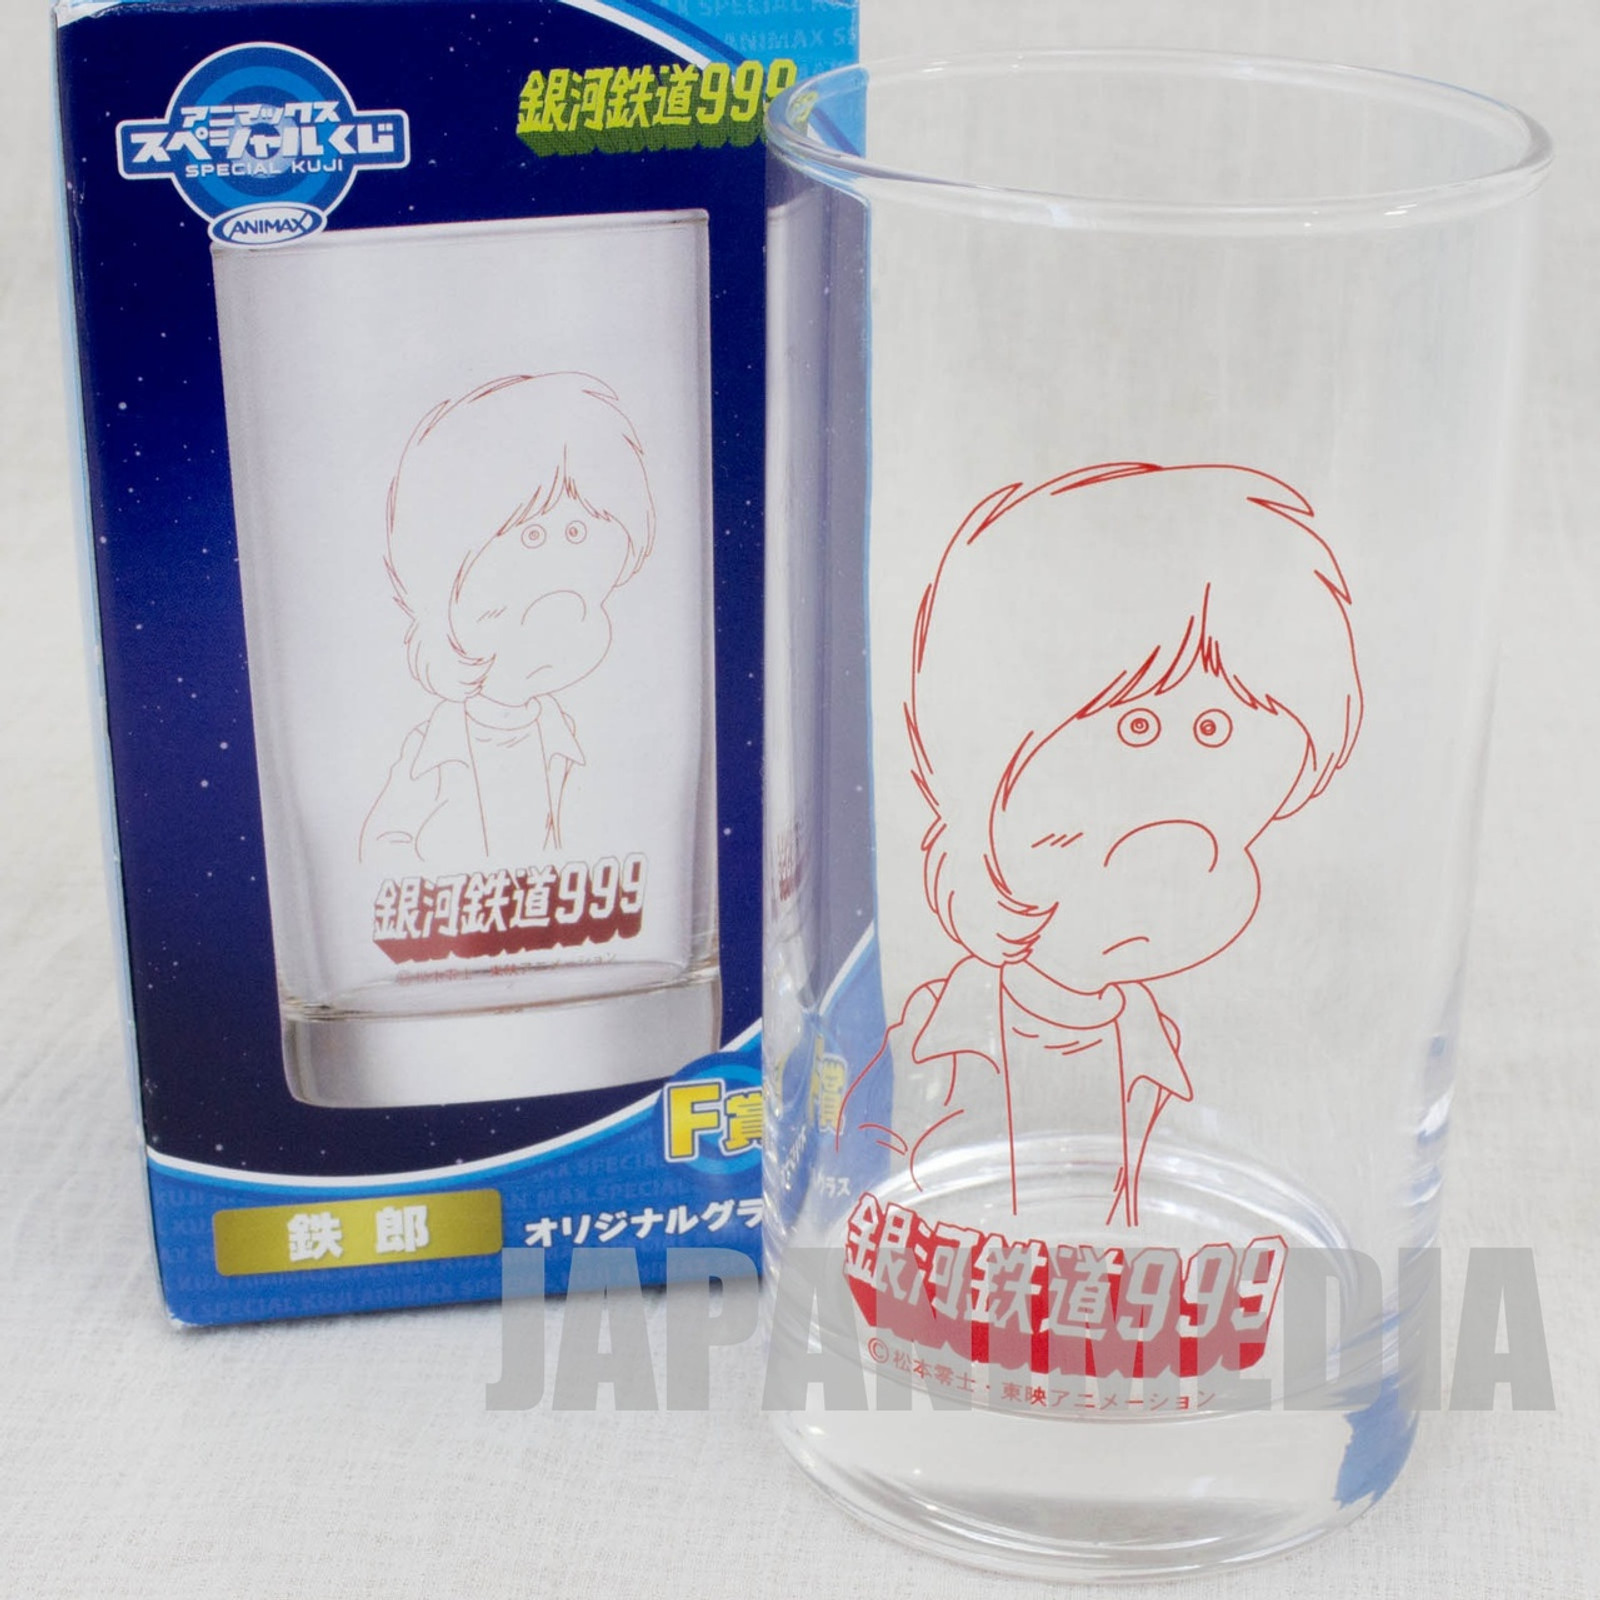 Galaxy Express 999 Tetsuro Glass Animax Special Kuji JAPAN ANIME